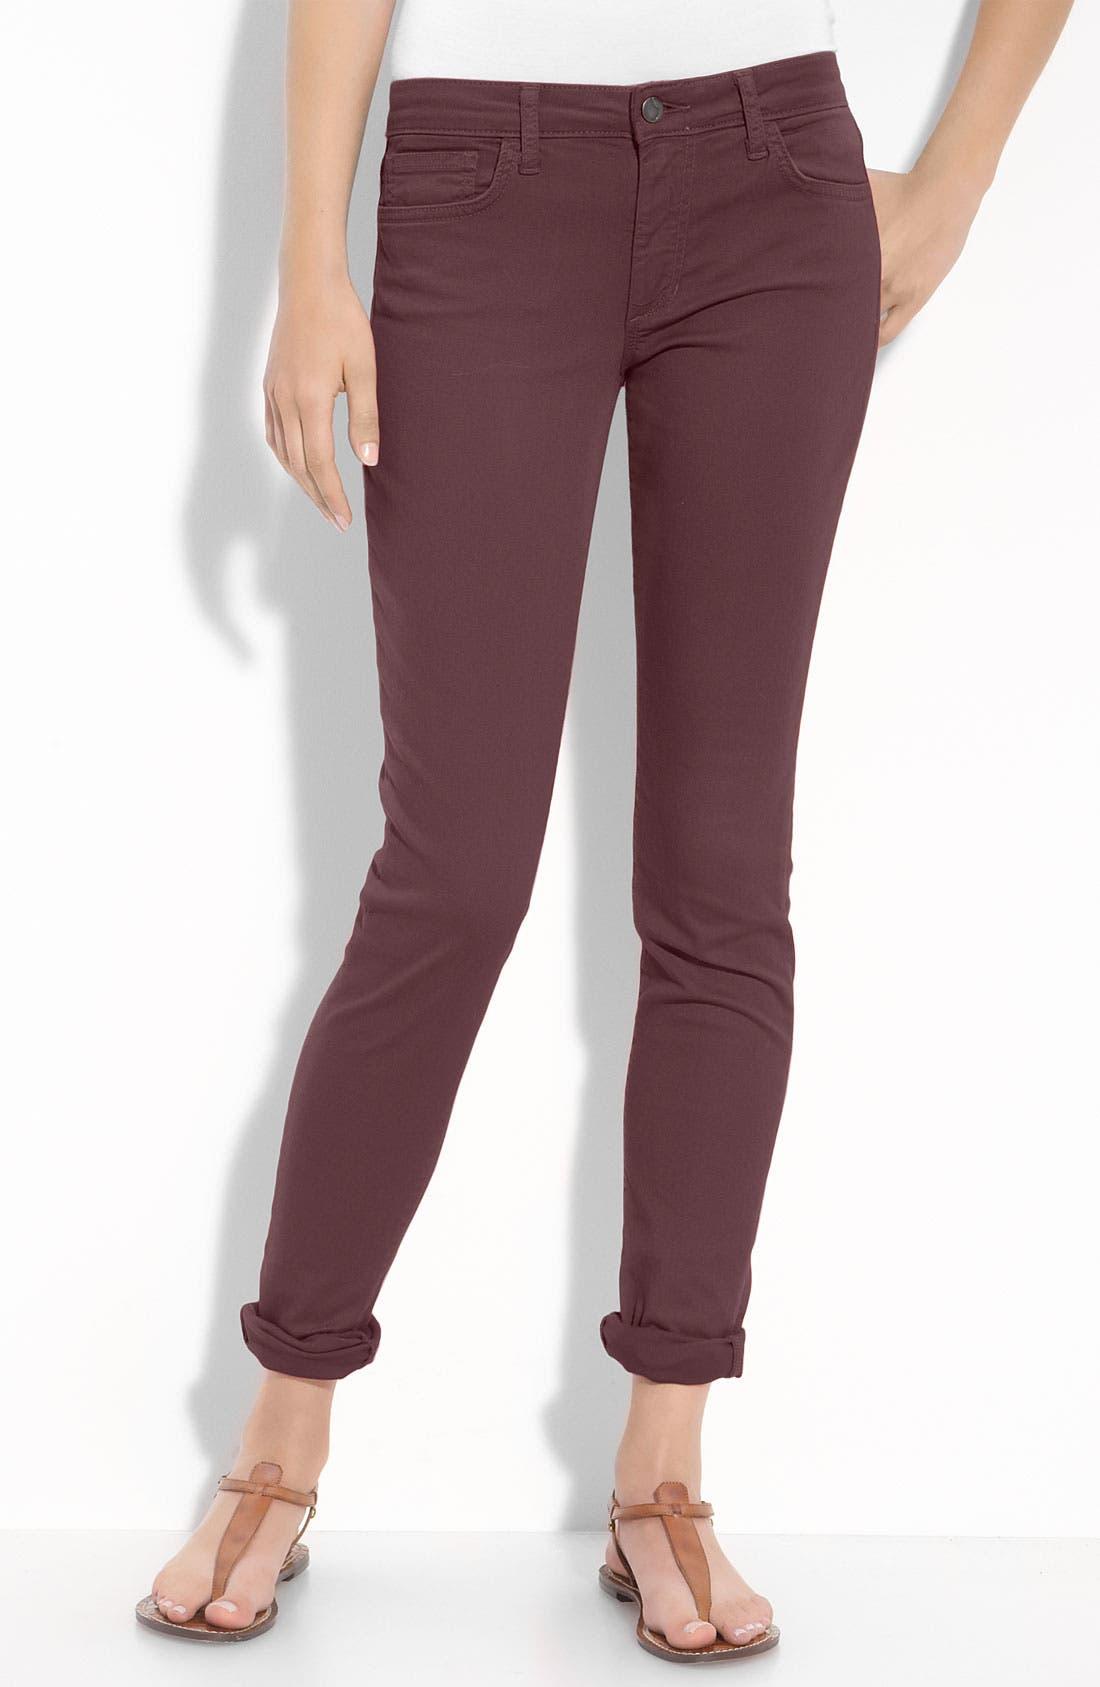 JOE'S, 'Chelsea' Skinny Stretch Denim Jeans, Main thumbnail 1, color, 200